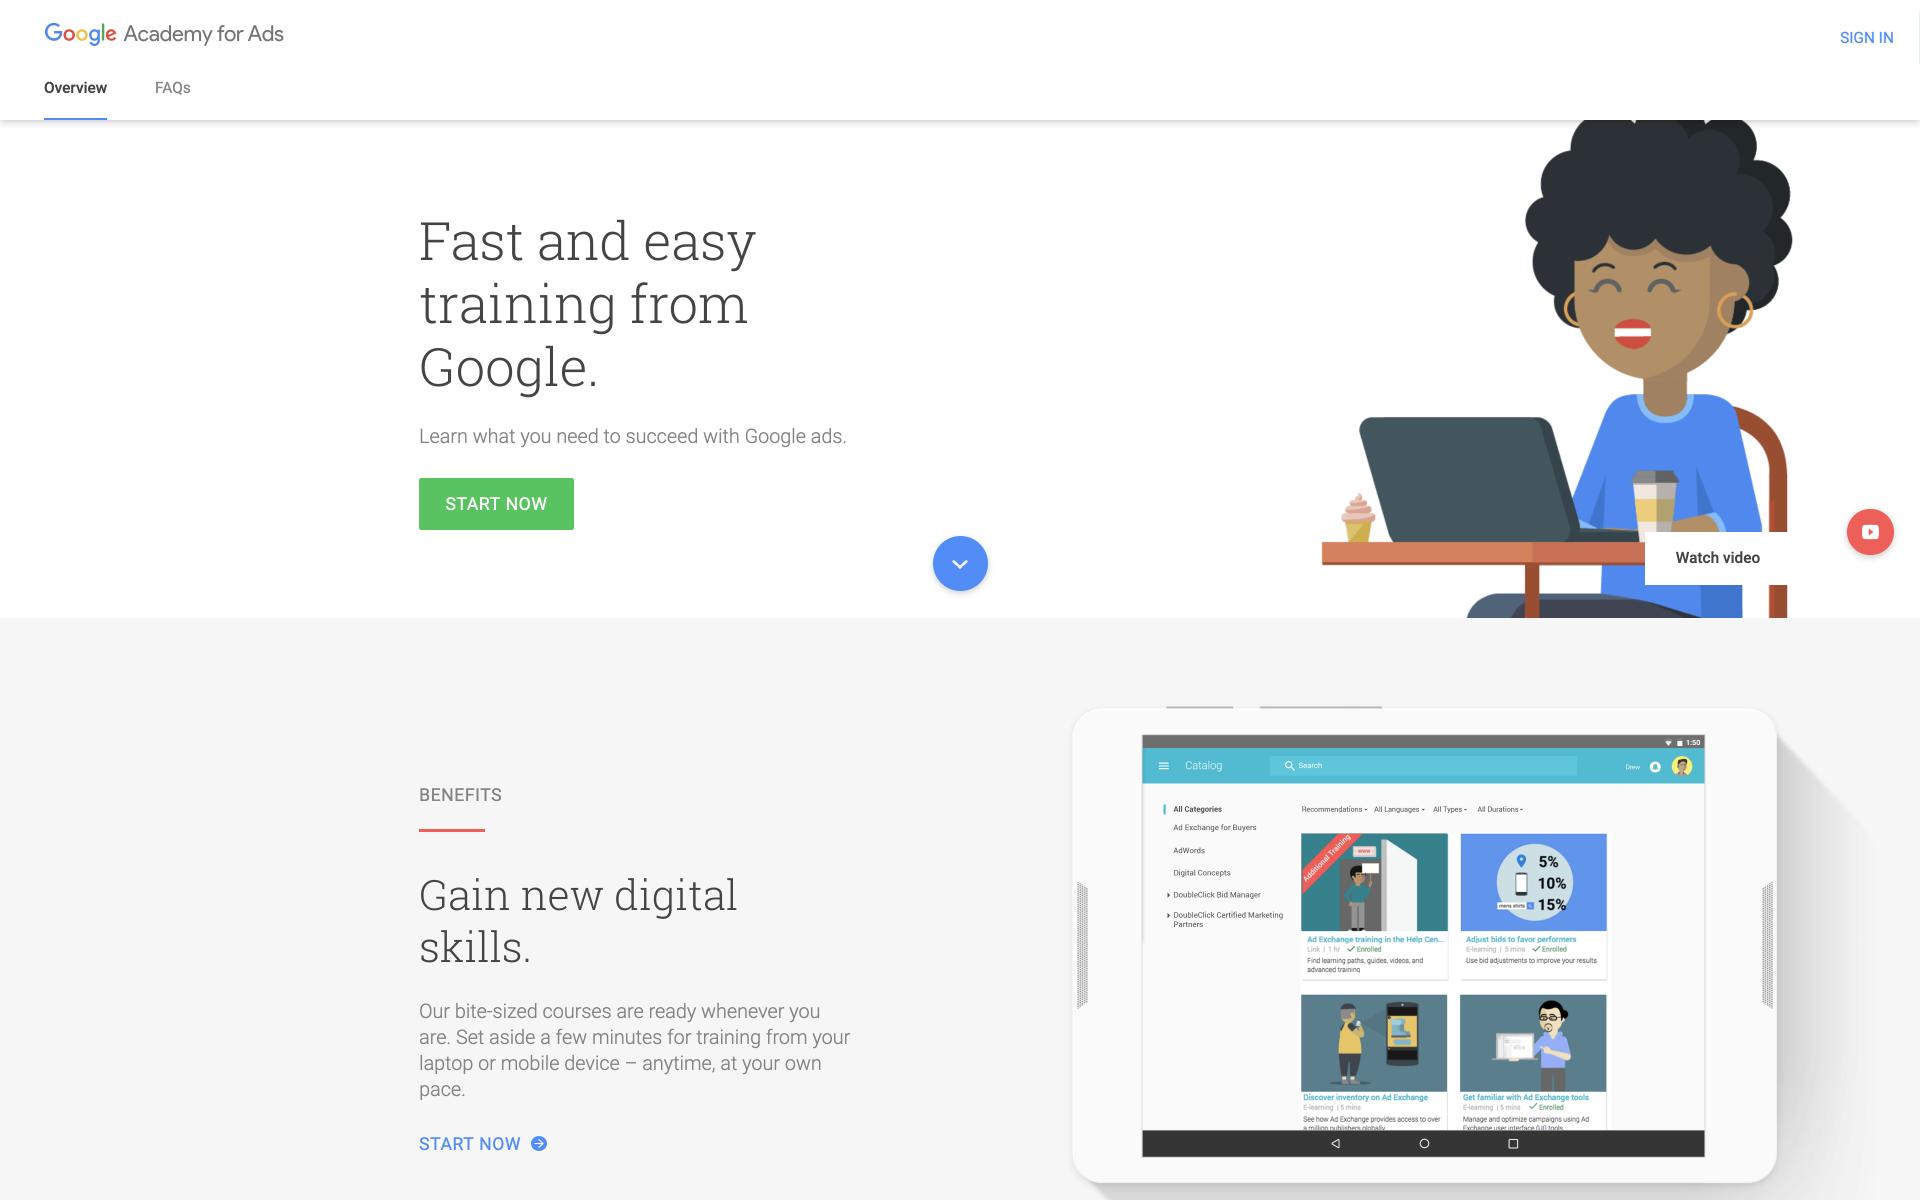 SEA_GoogleAcademy